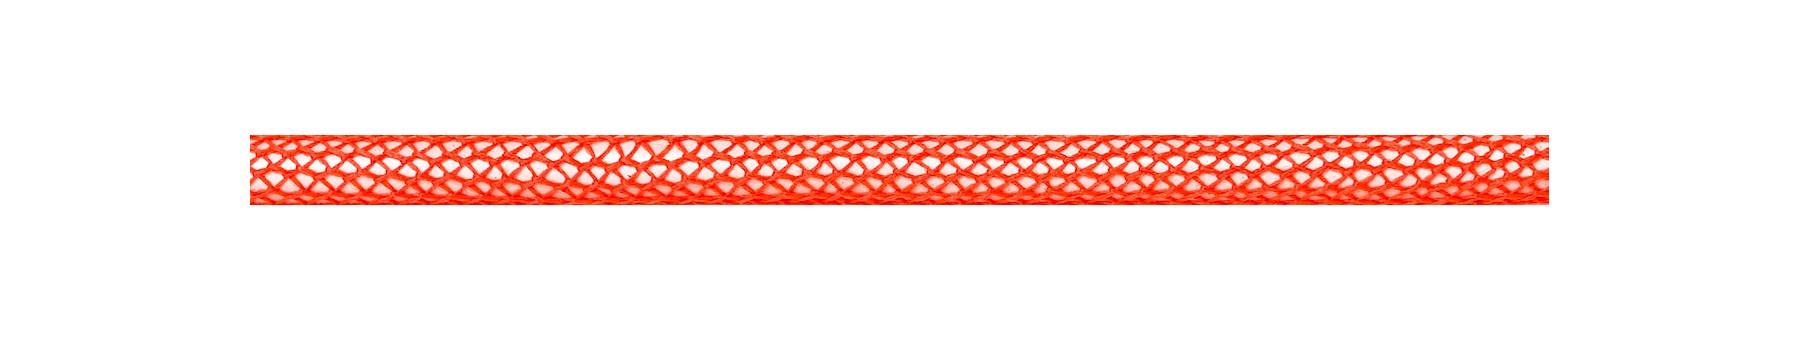 Textile Cable Neon Orange Netlike Covering